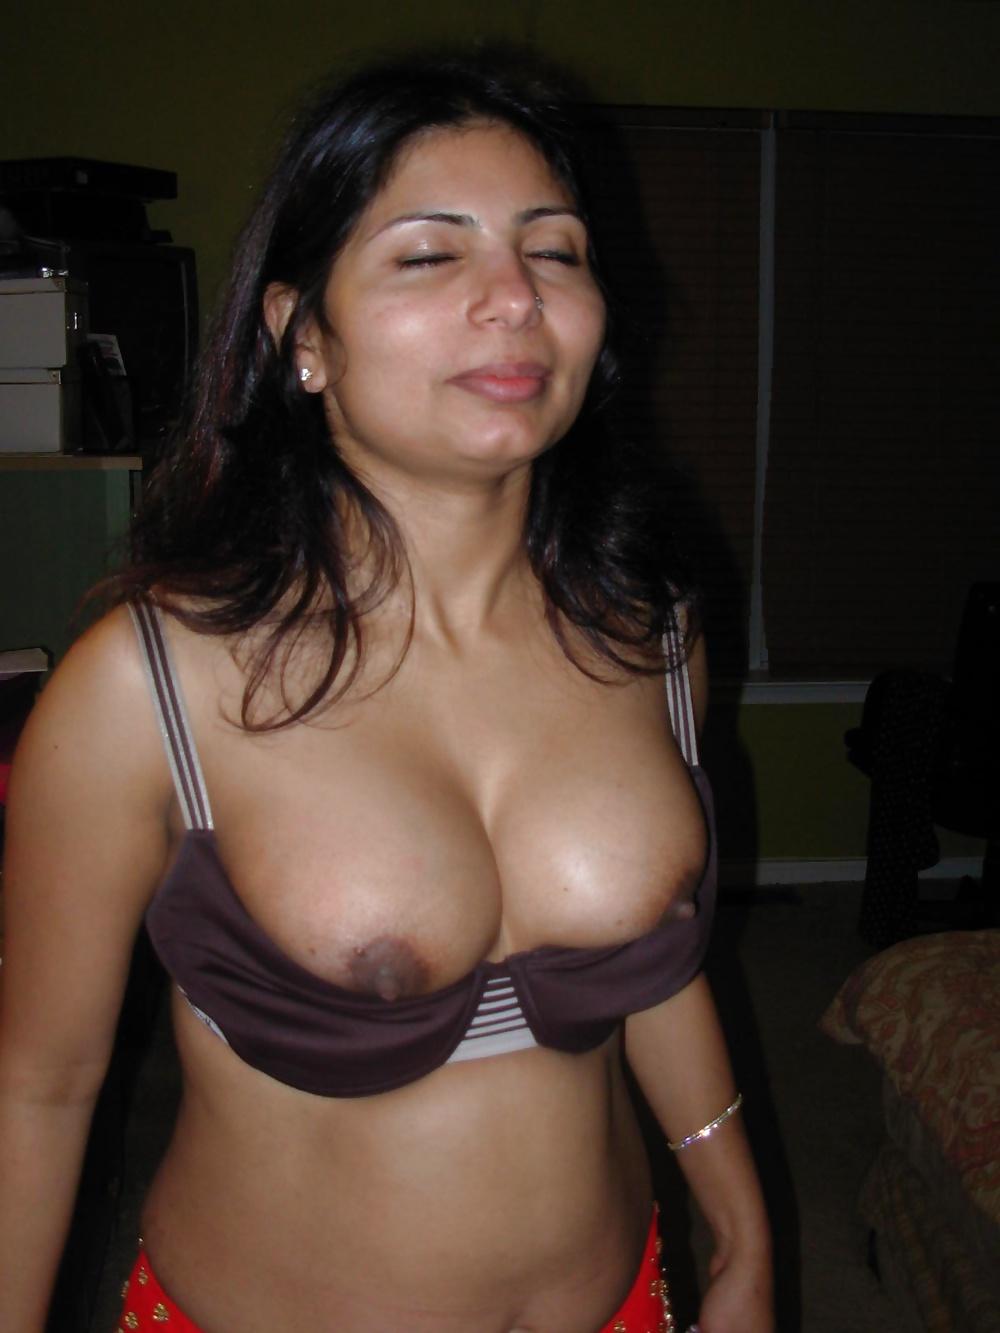 Big Boobs Bengali Bhabhi